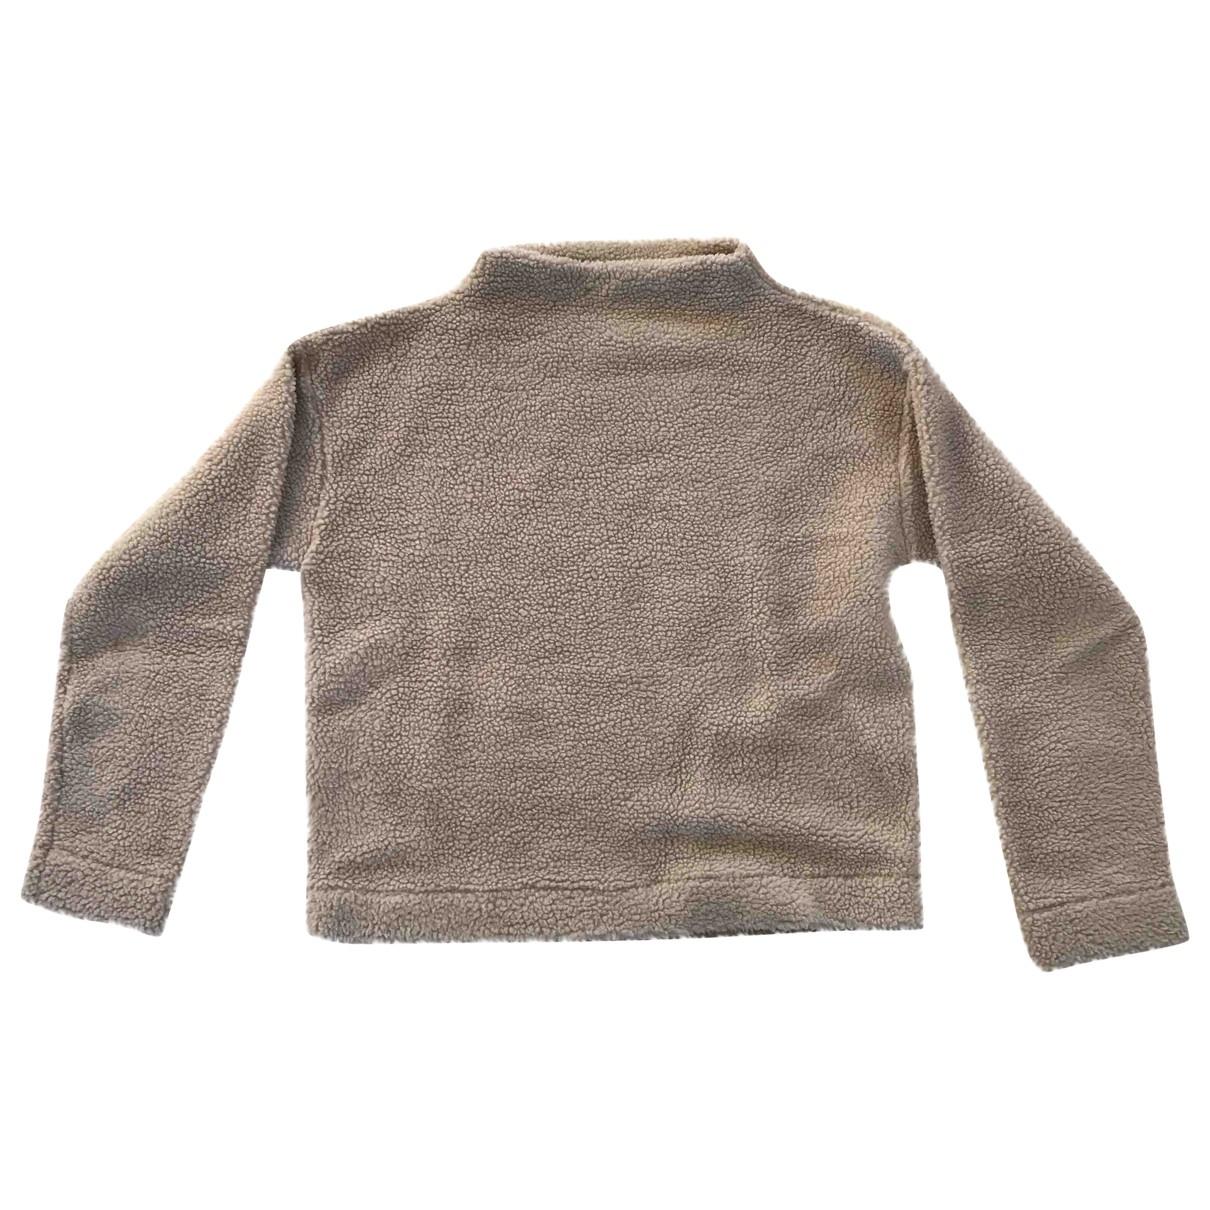 Bellerose \N Pullover, StrickJacke in  Beige Polyester